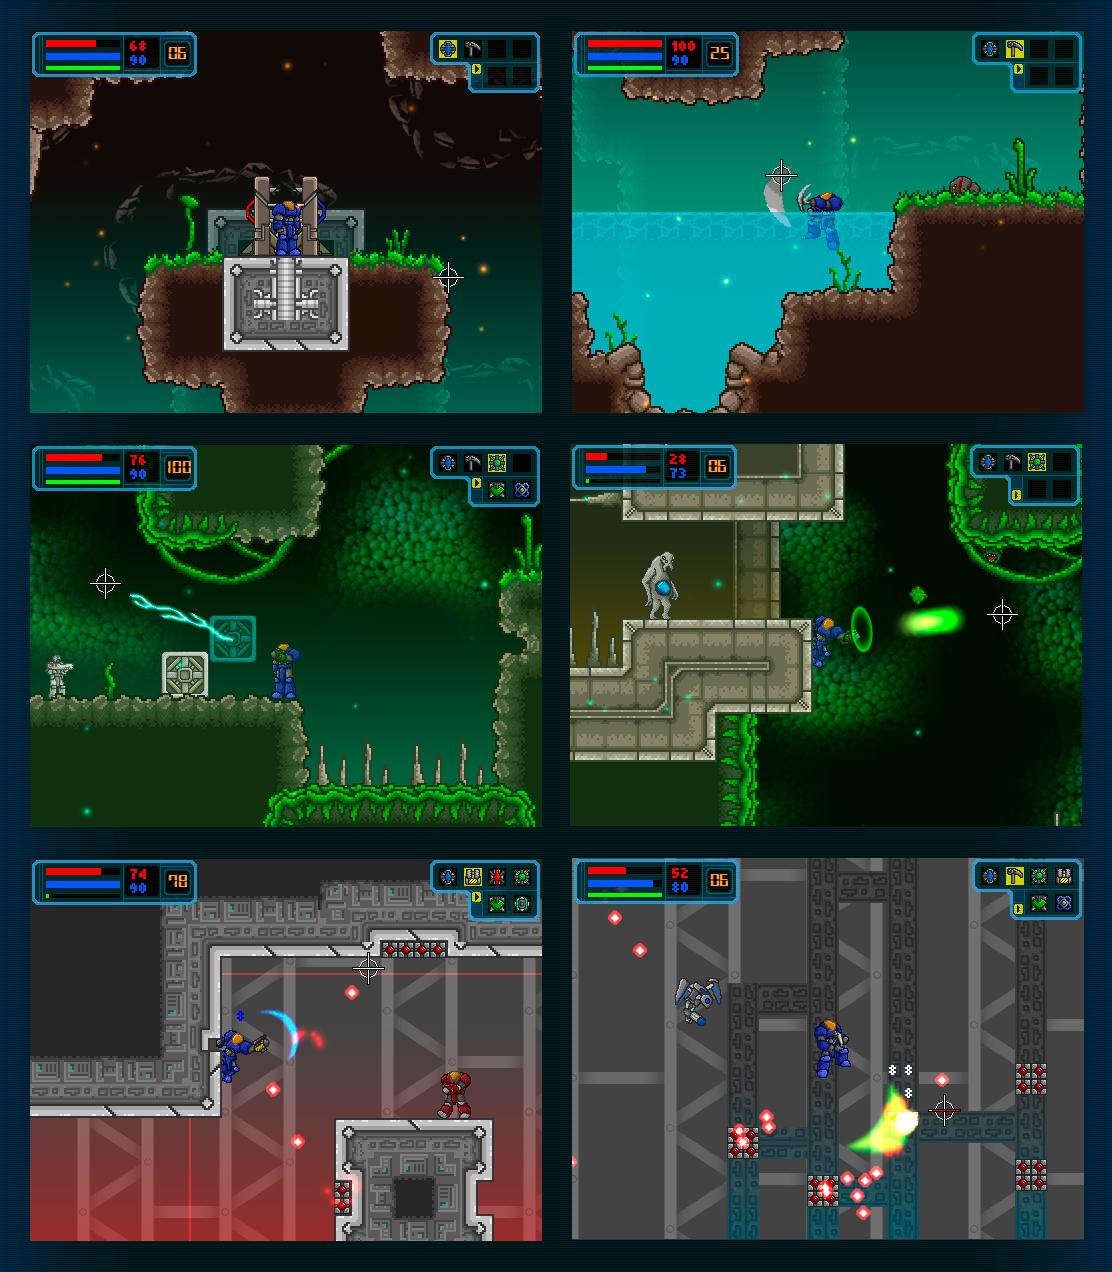 Galactic Marine - Areas 1-3 by BeholderKin